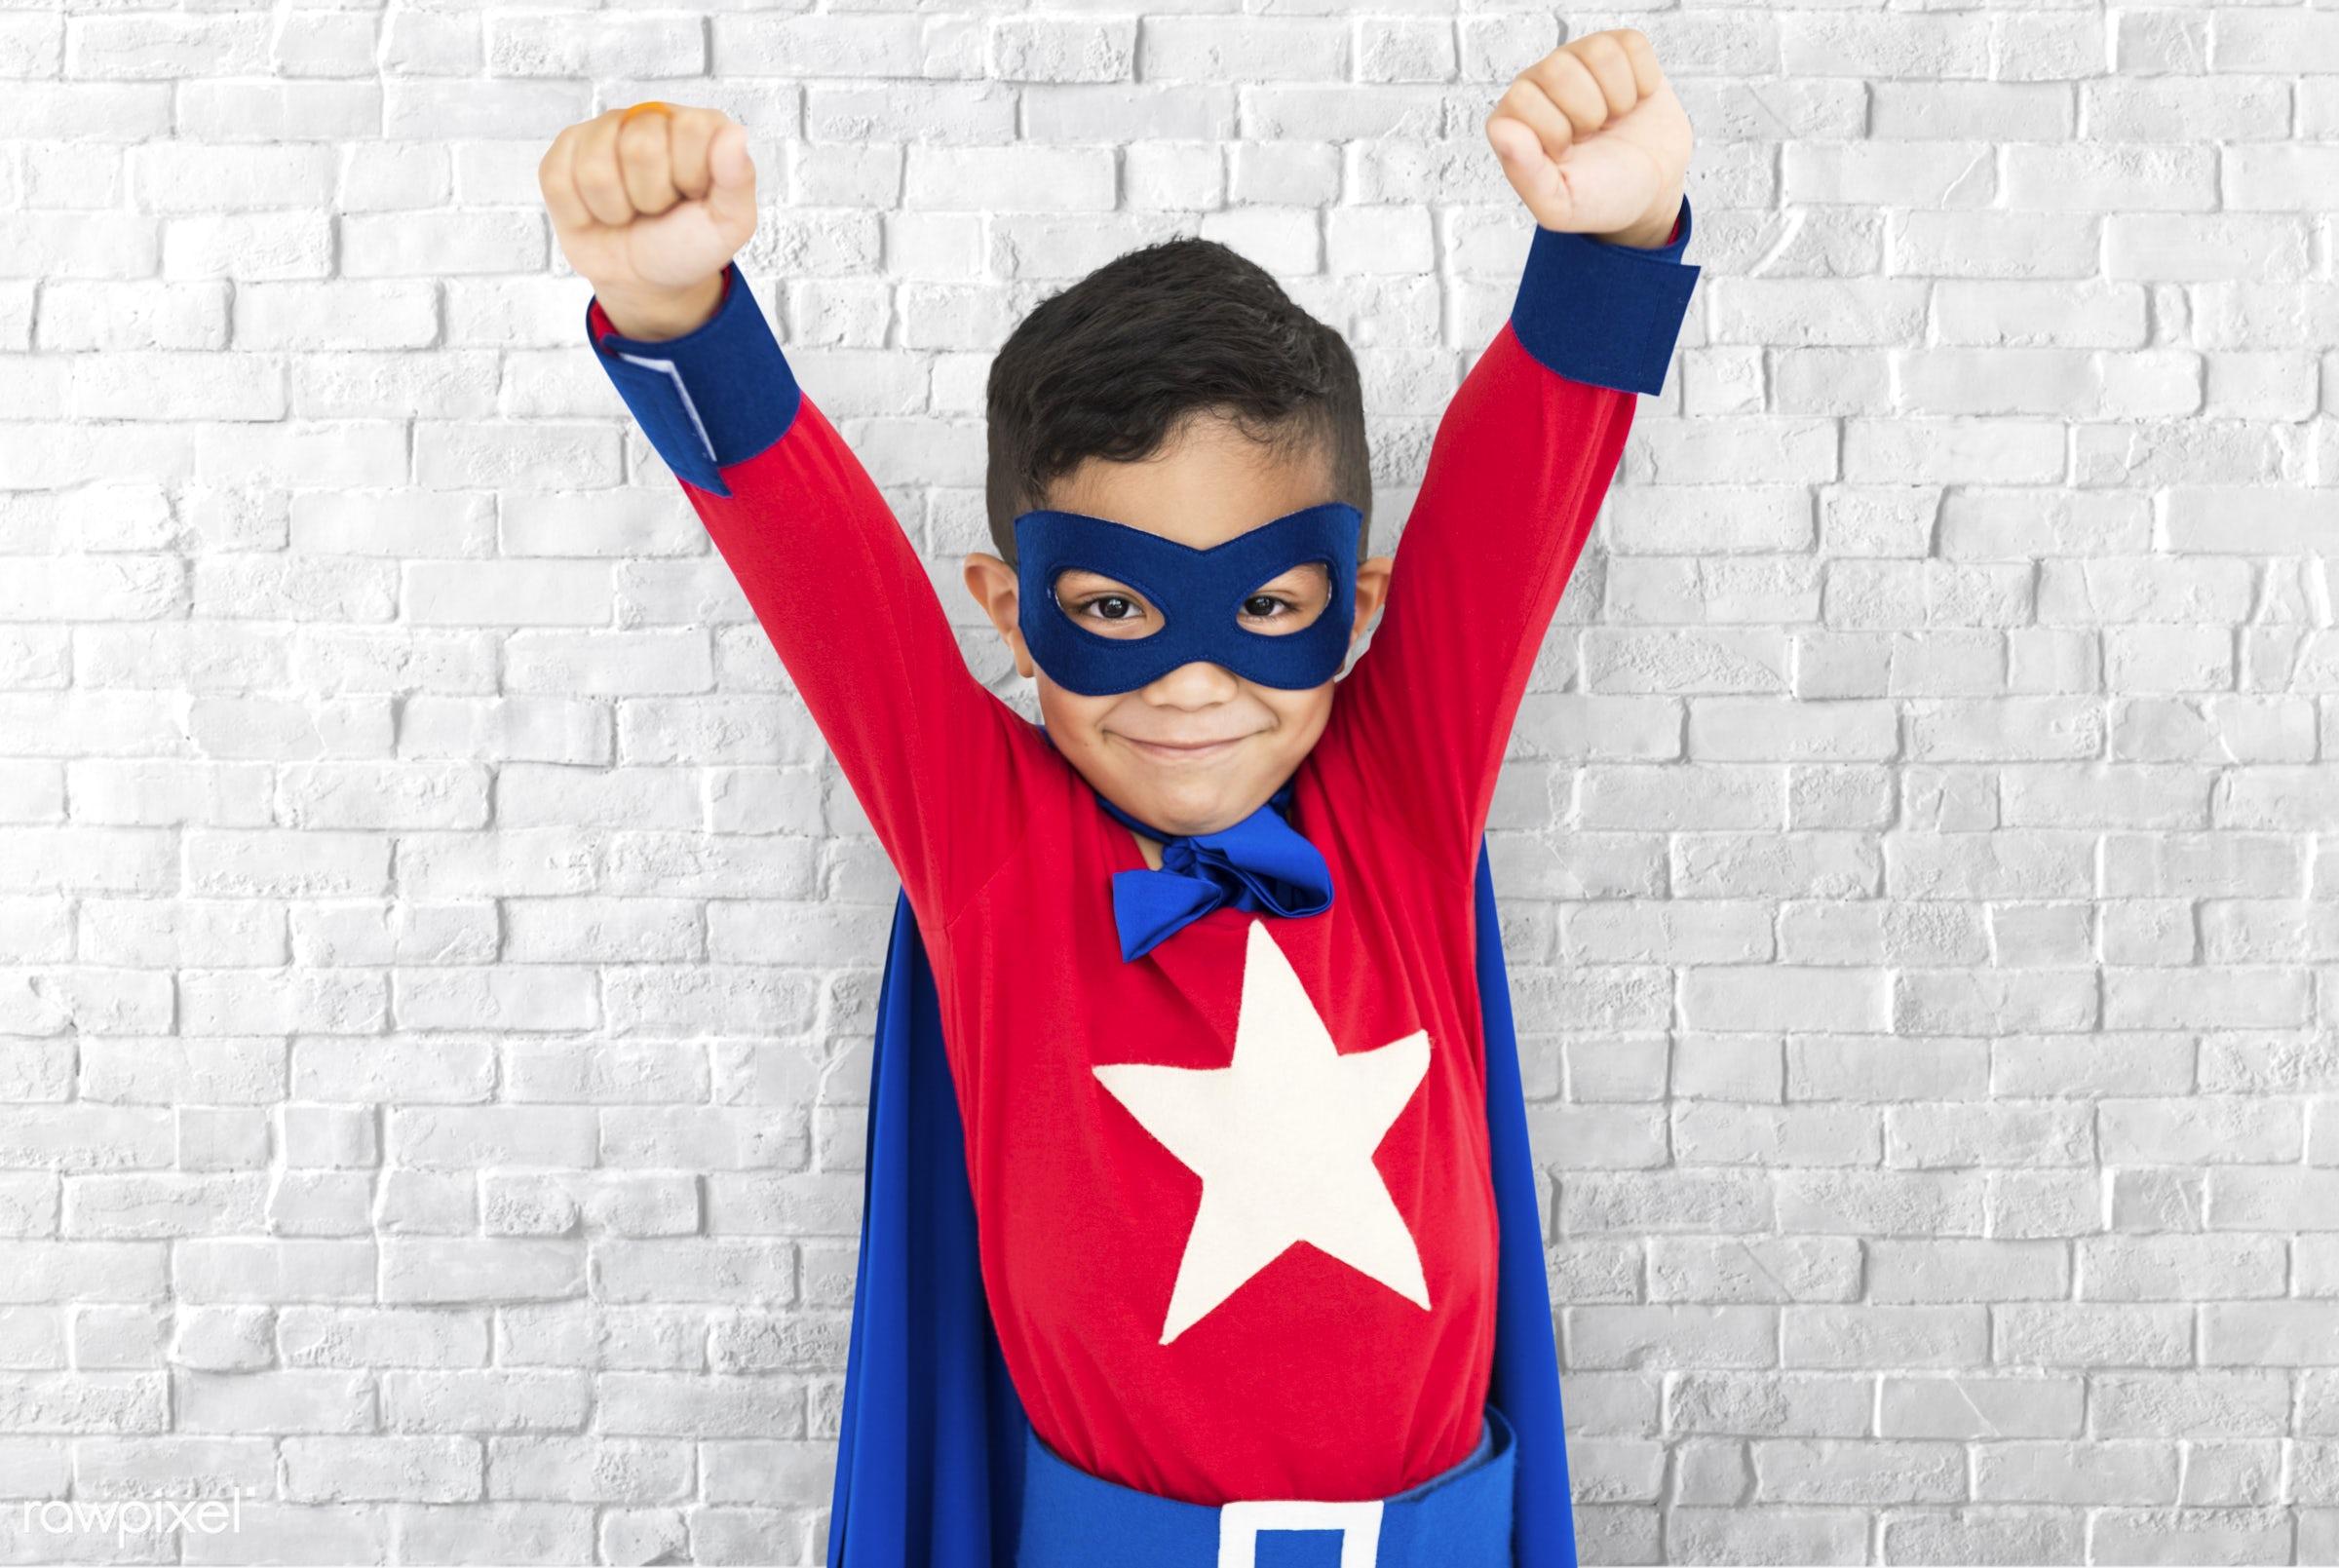 brick, children, courageous, adolescence, kid, child, inspiration, leader, idol, childhood, superhero, isolated, hero,...